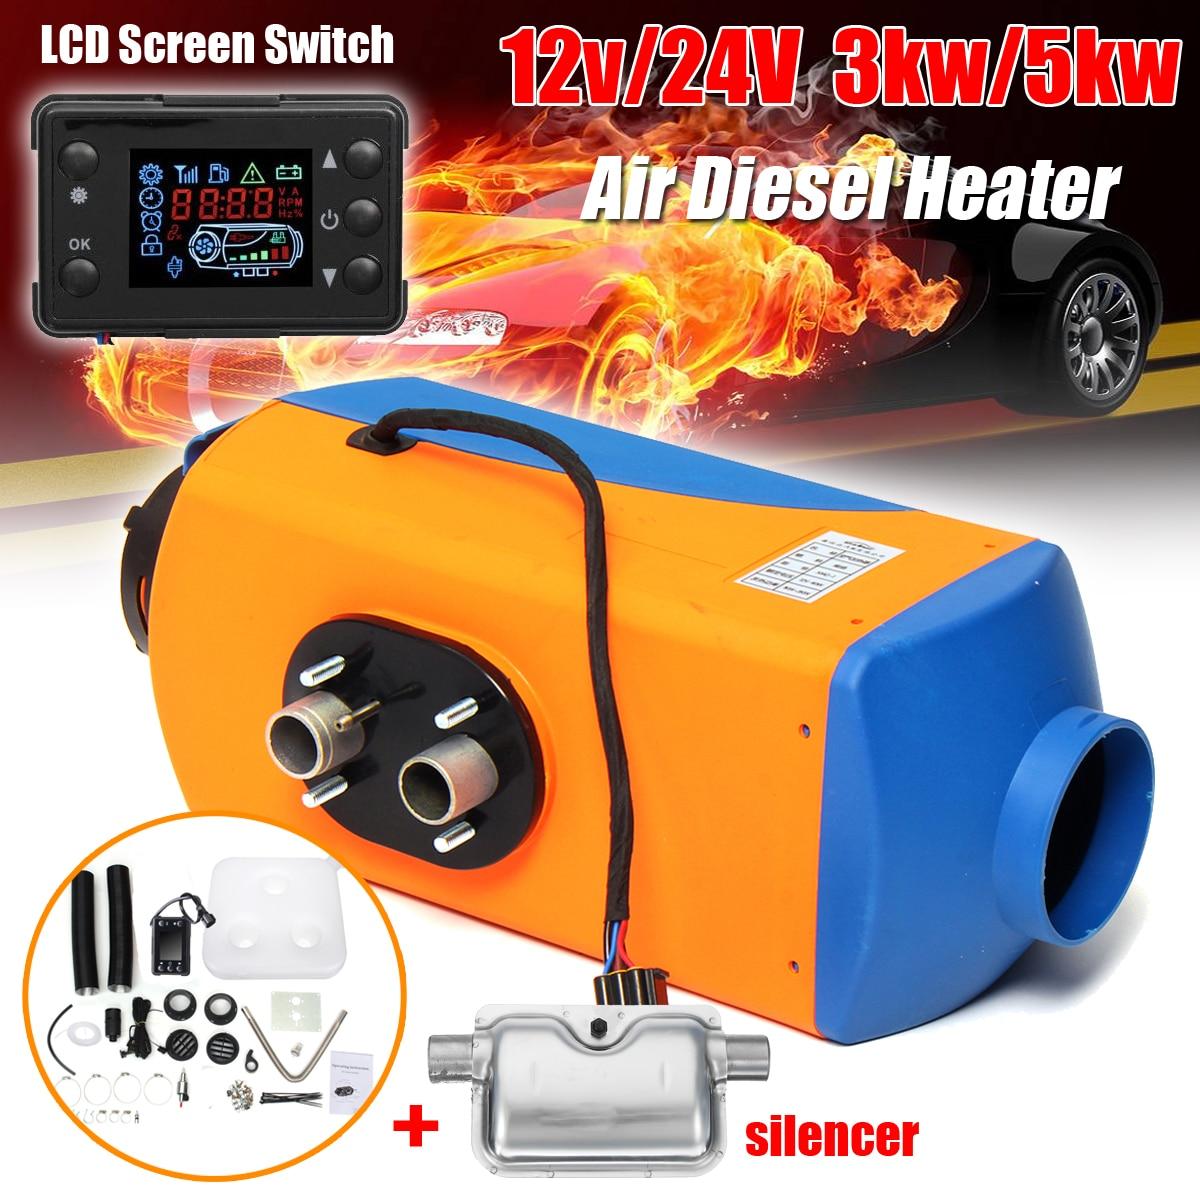 ew 12V 5KW Diesel Air Heater Tank 2x Vent Duct Thermostat Caravan Motorhome Us